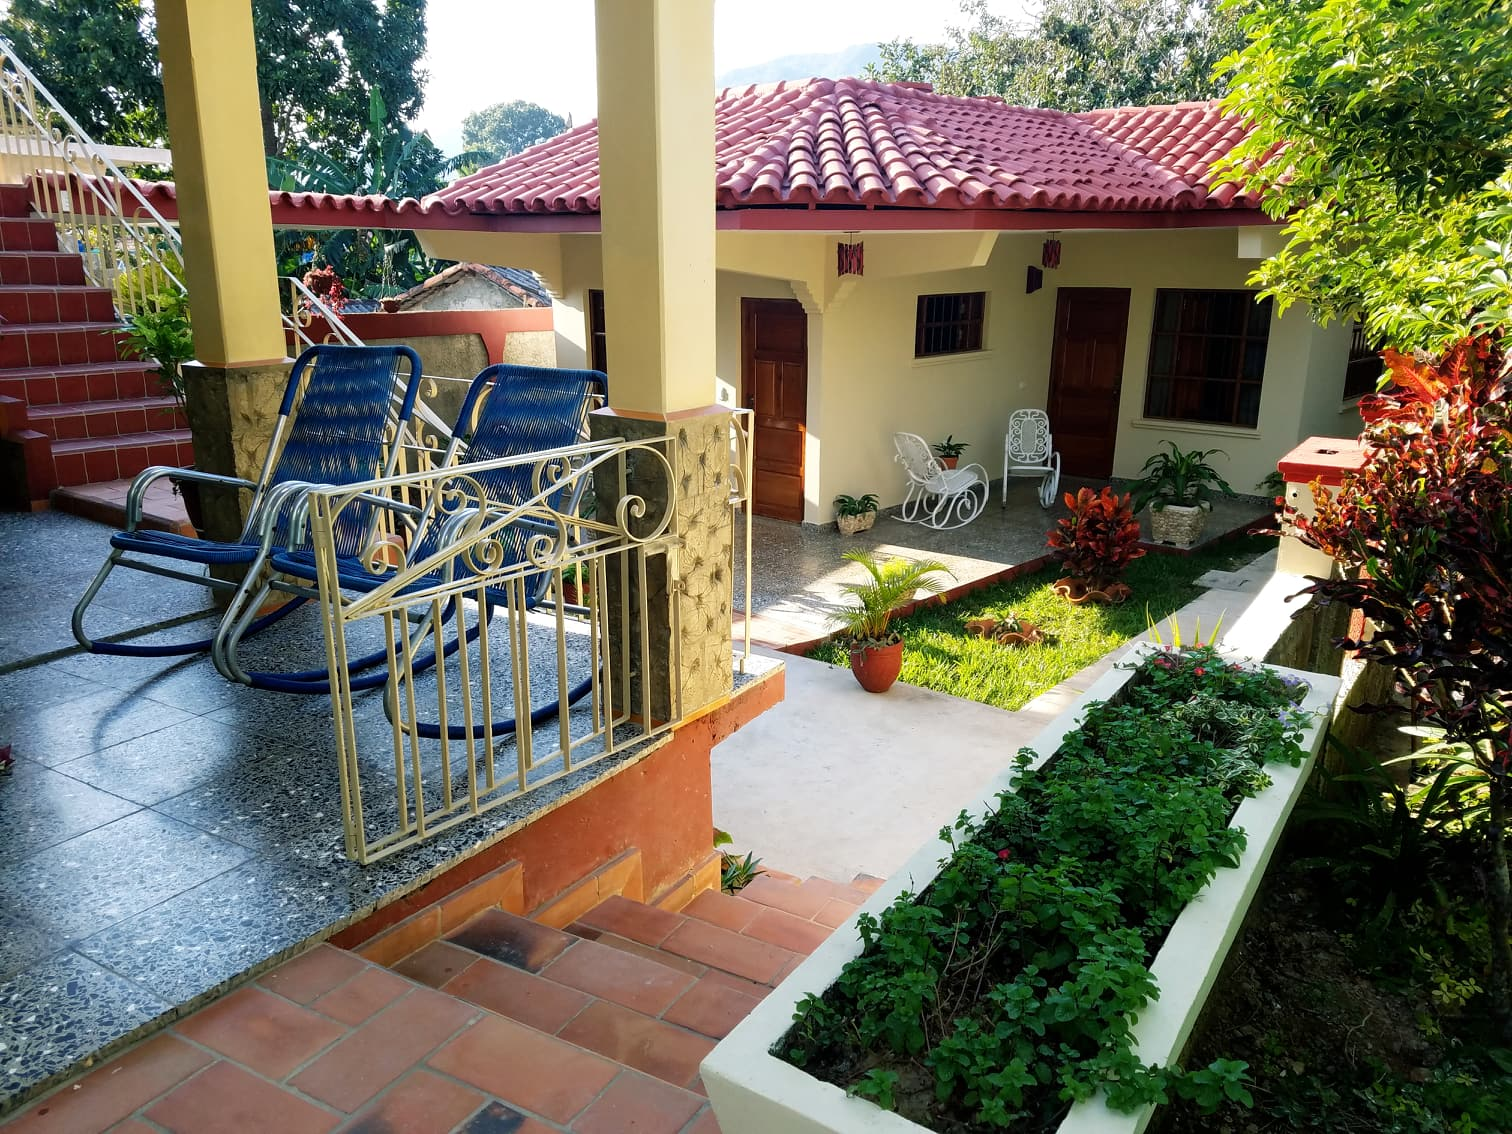 VIN004 - Casa Maritza y Tato